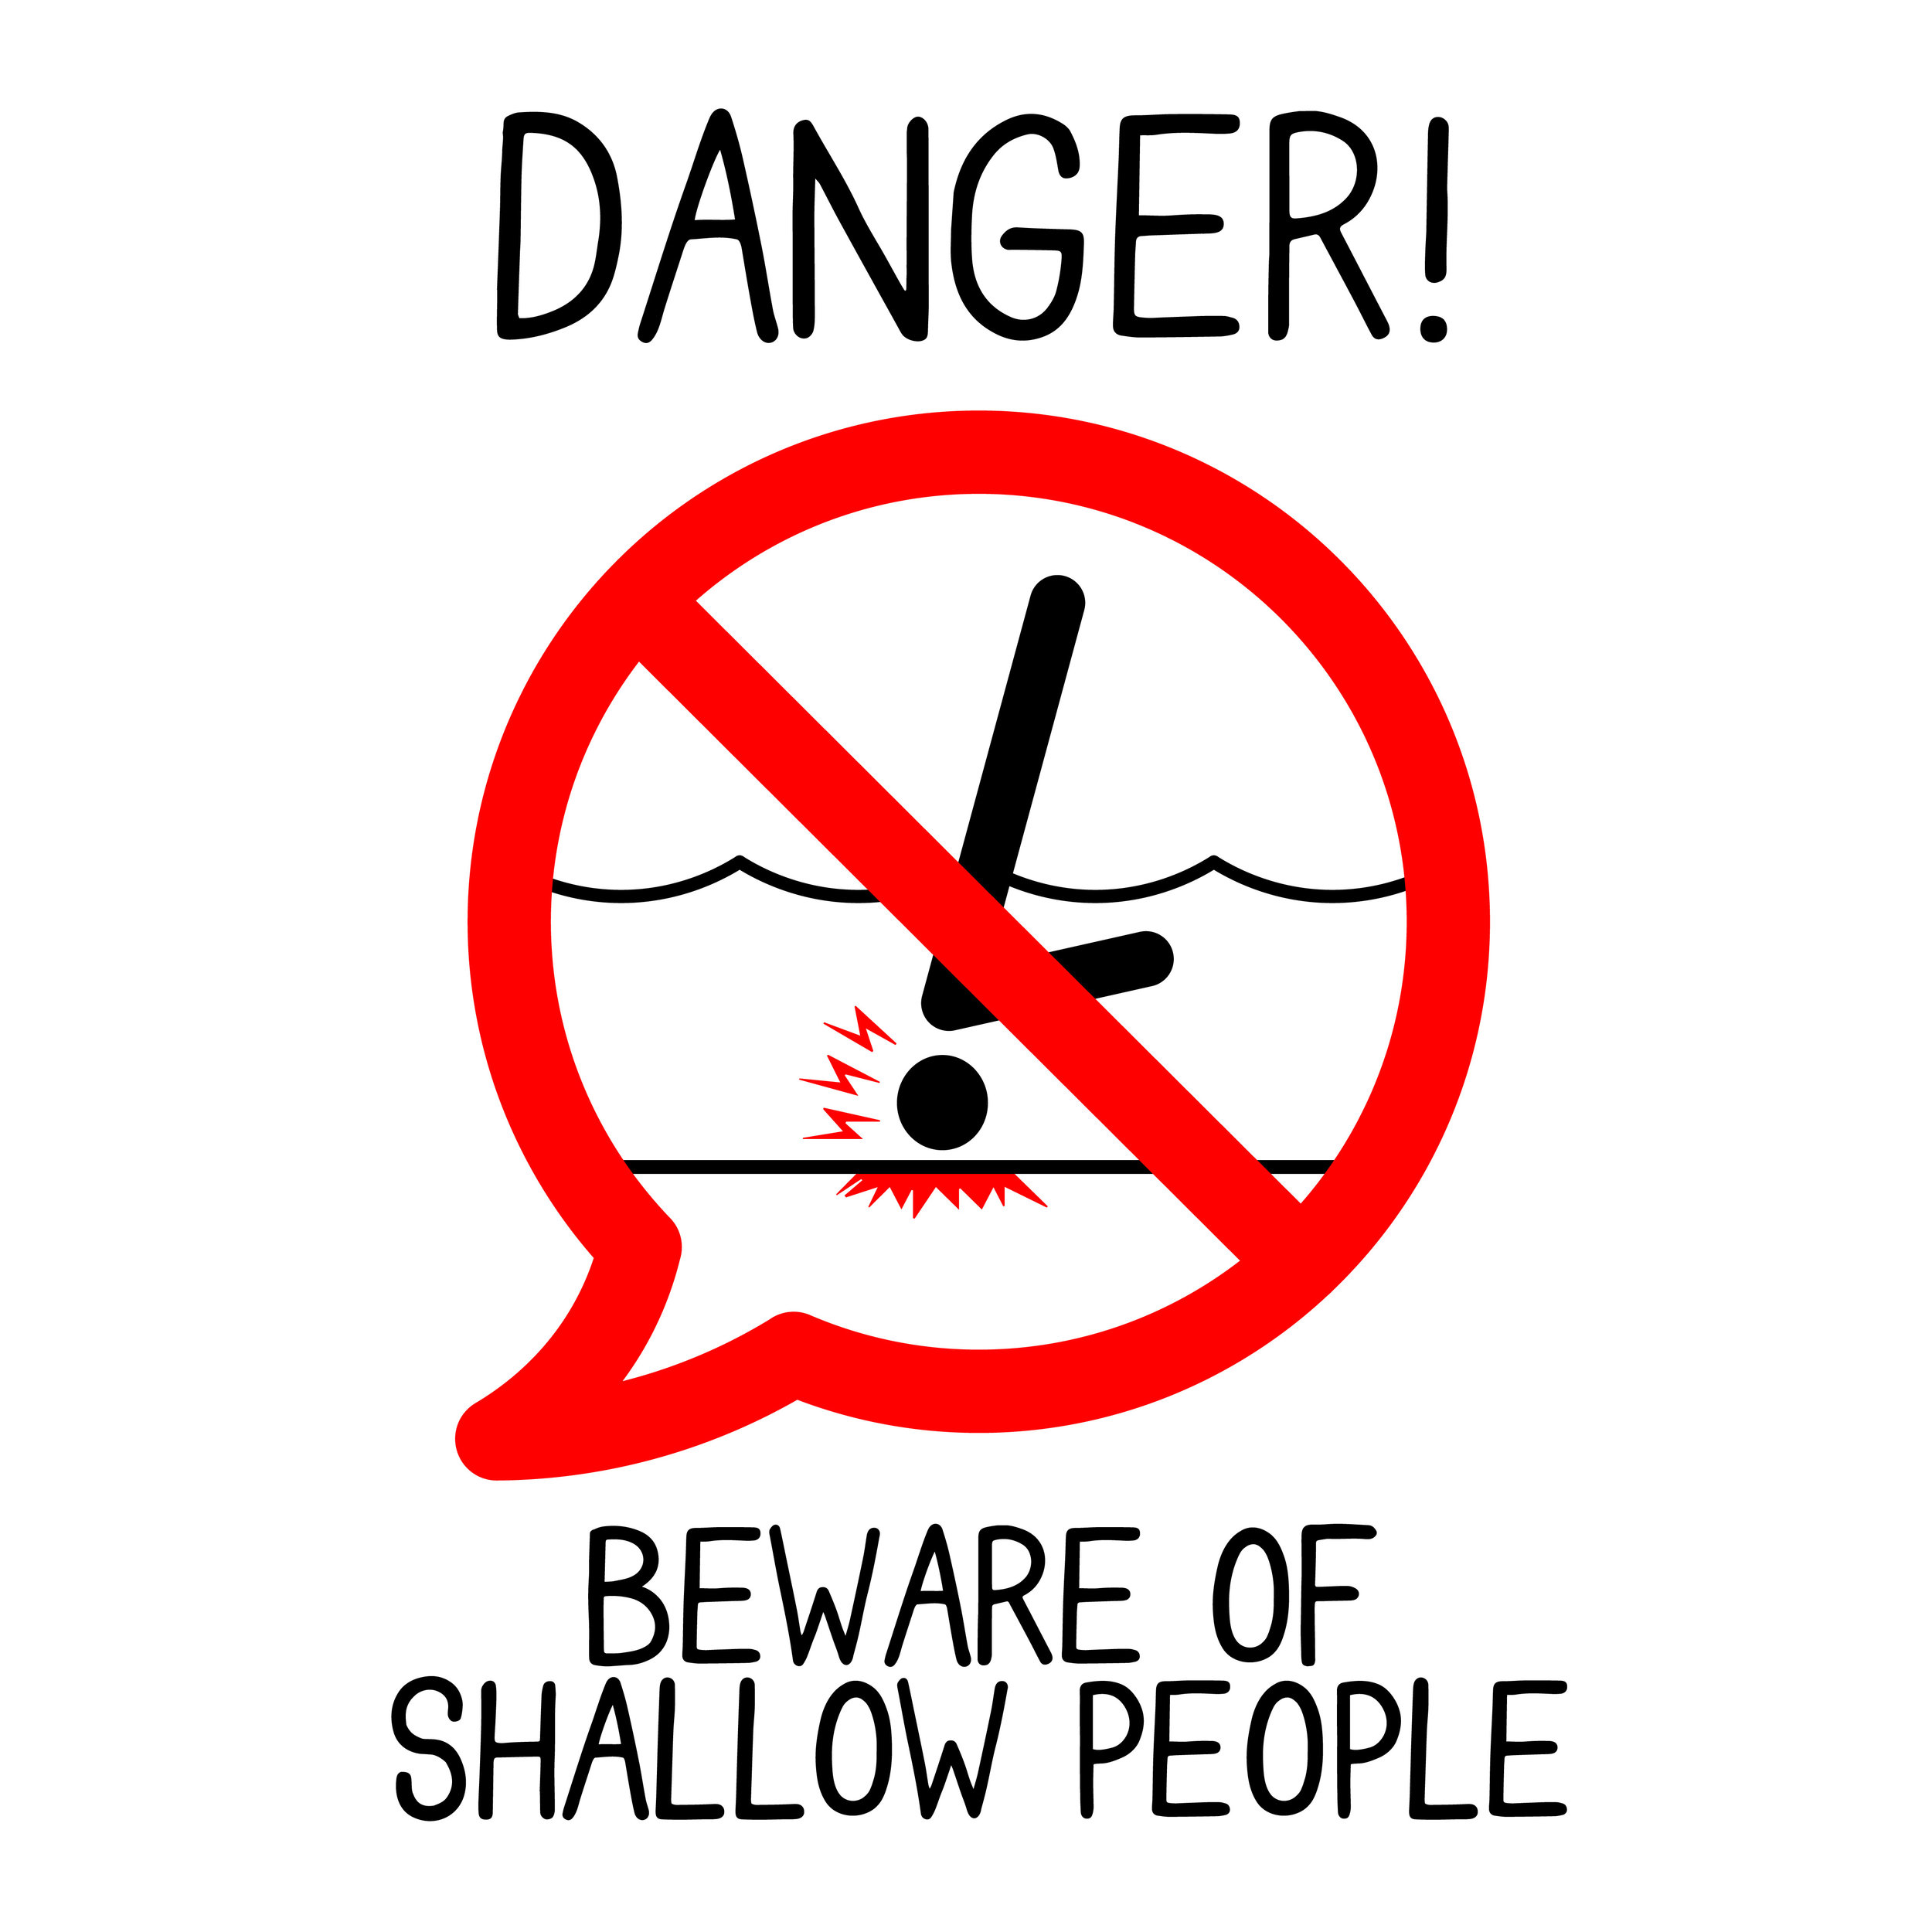 shallowpeople-01.jpg